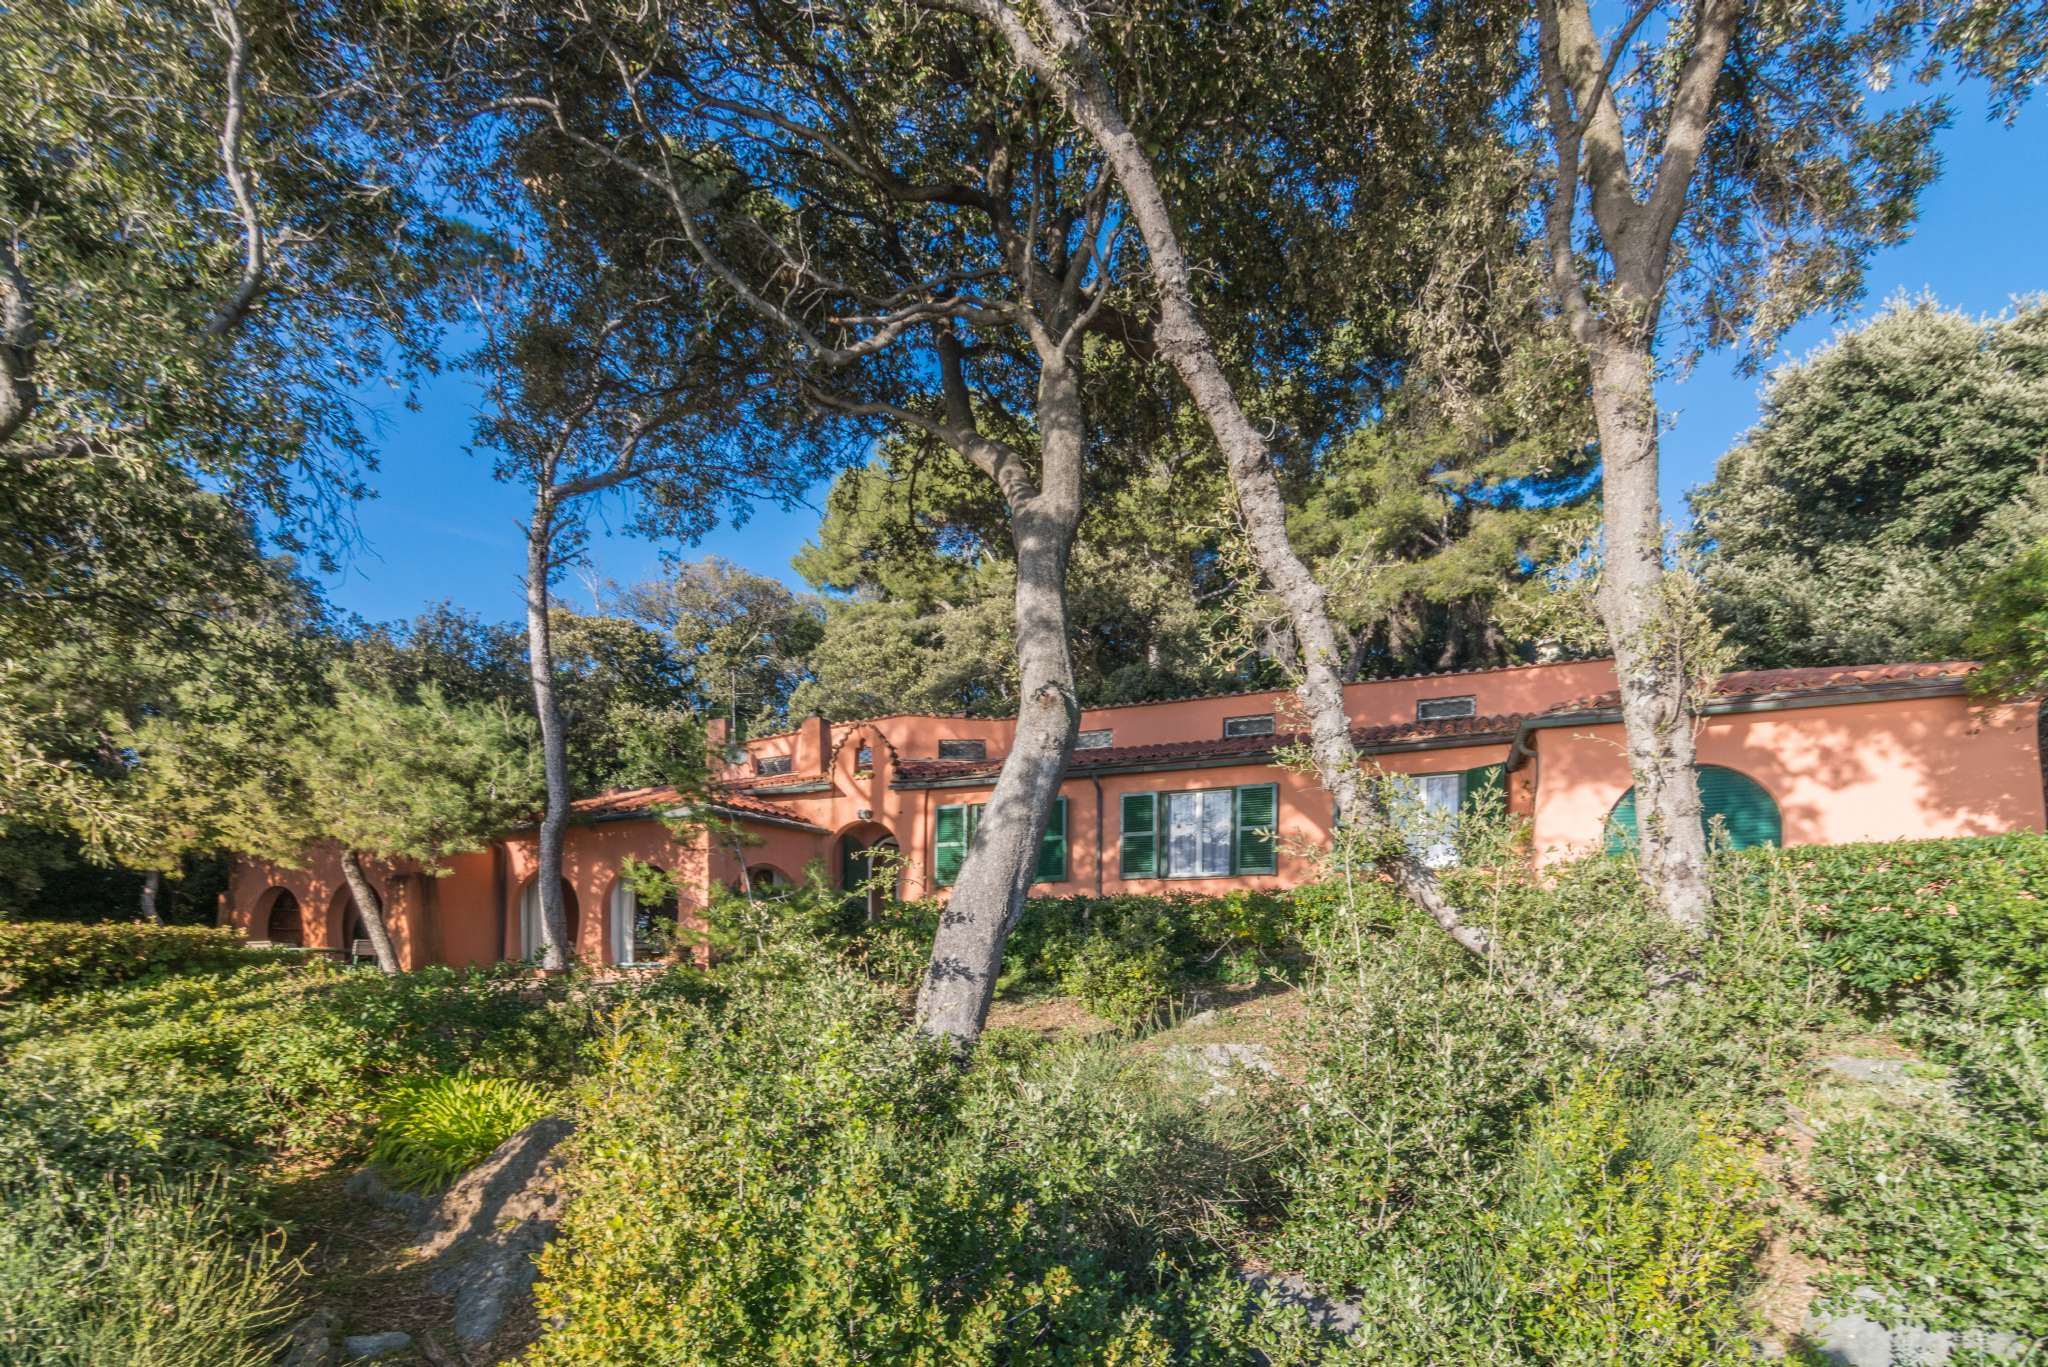 Villa in Vendita a Lerici: 5 locali, 300 mq - Foto 5